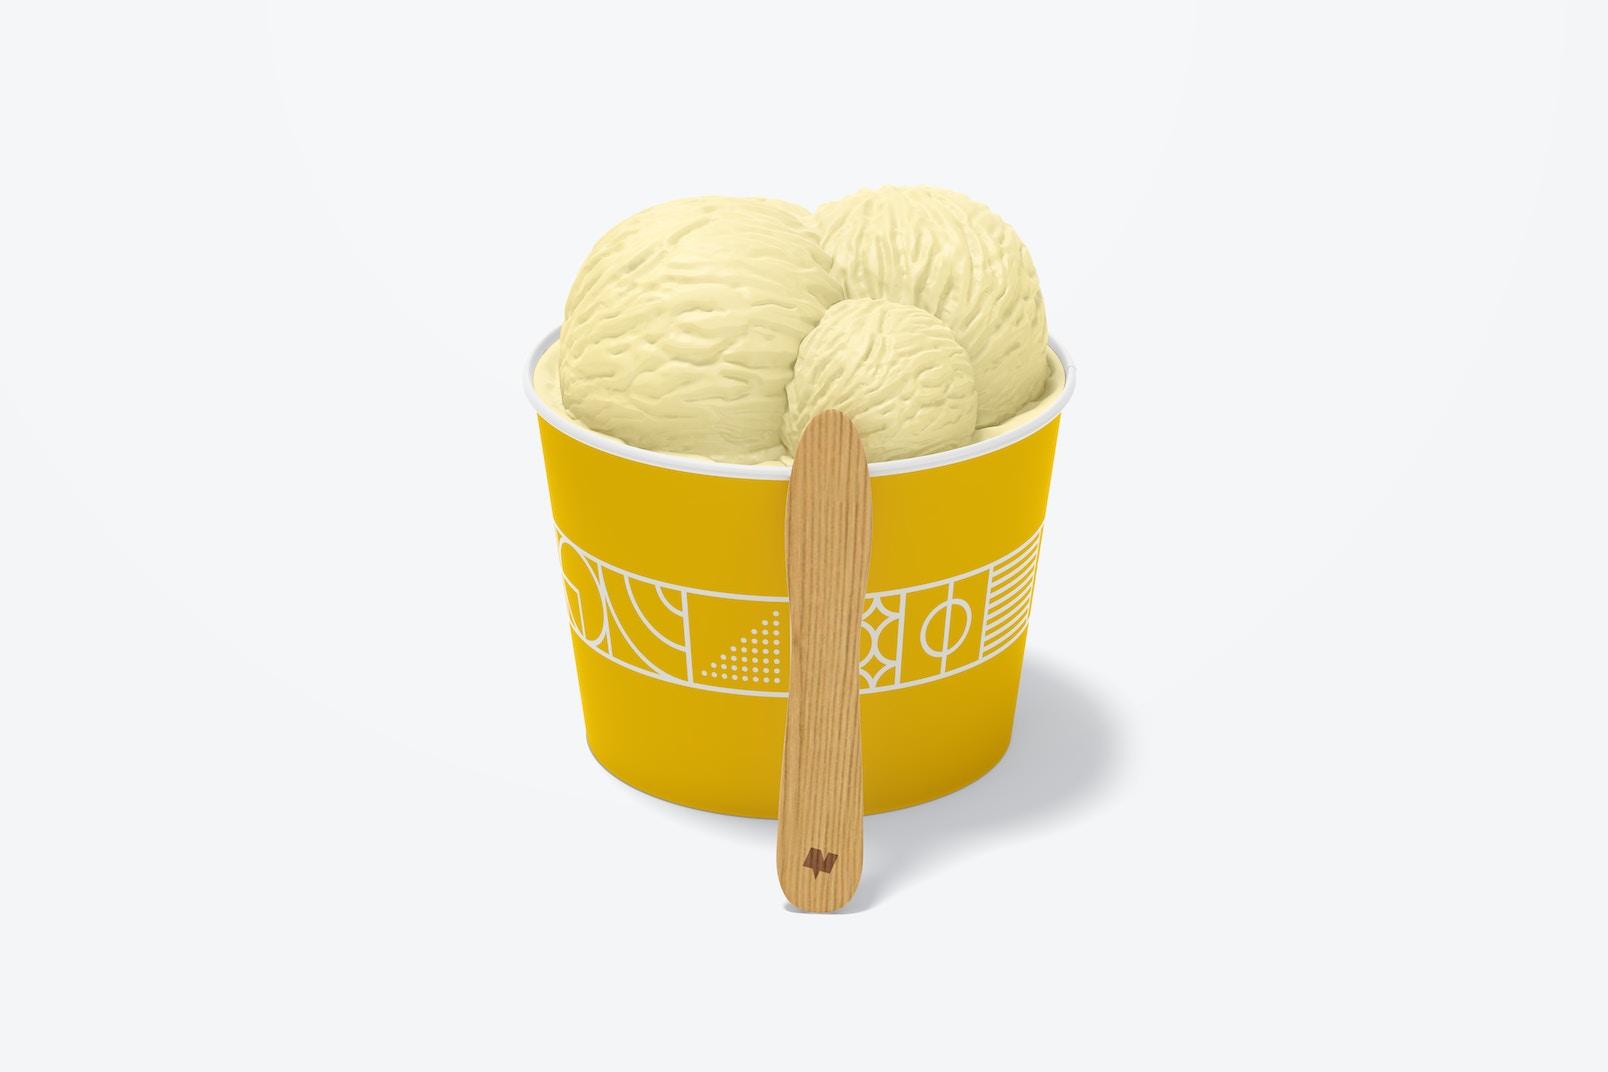 3 oz Paper Ice Cream Cup Mockup